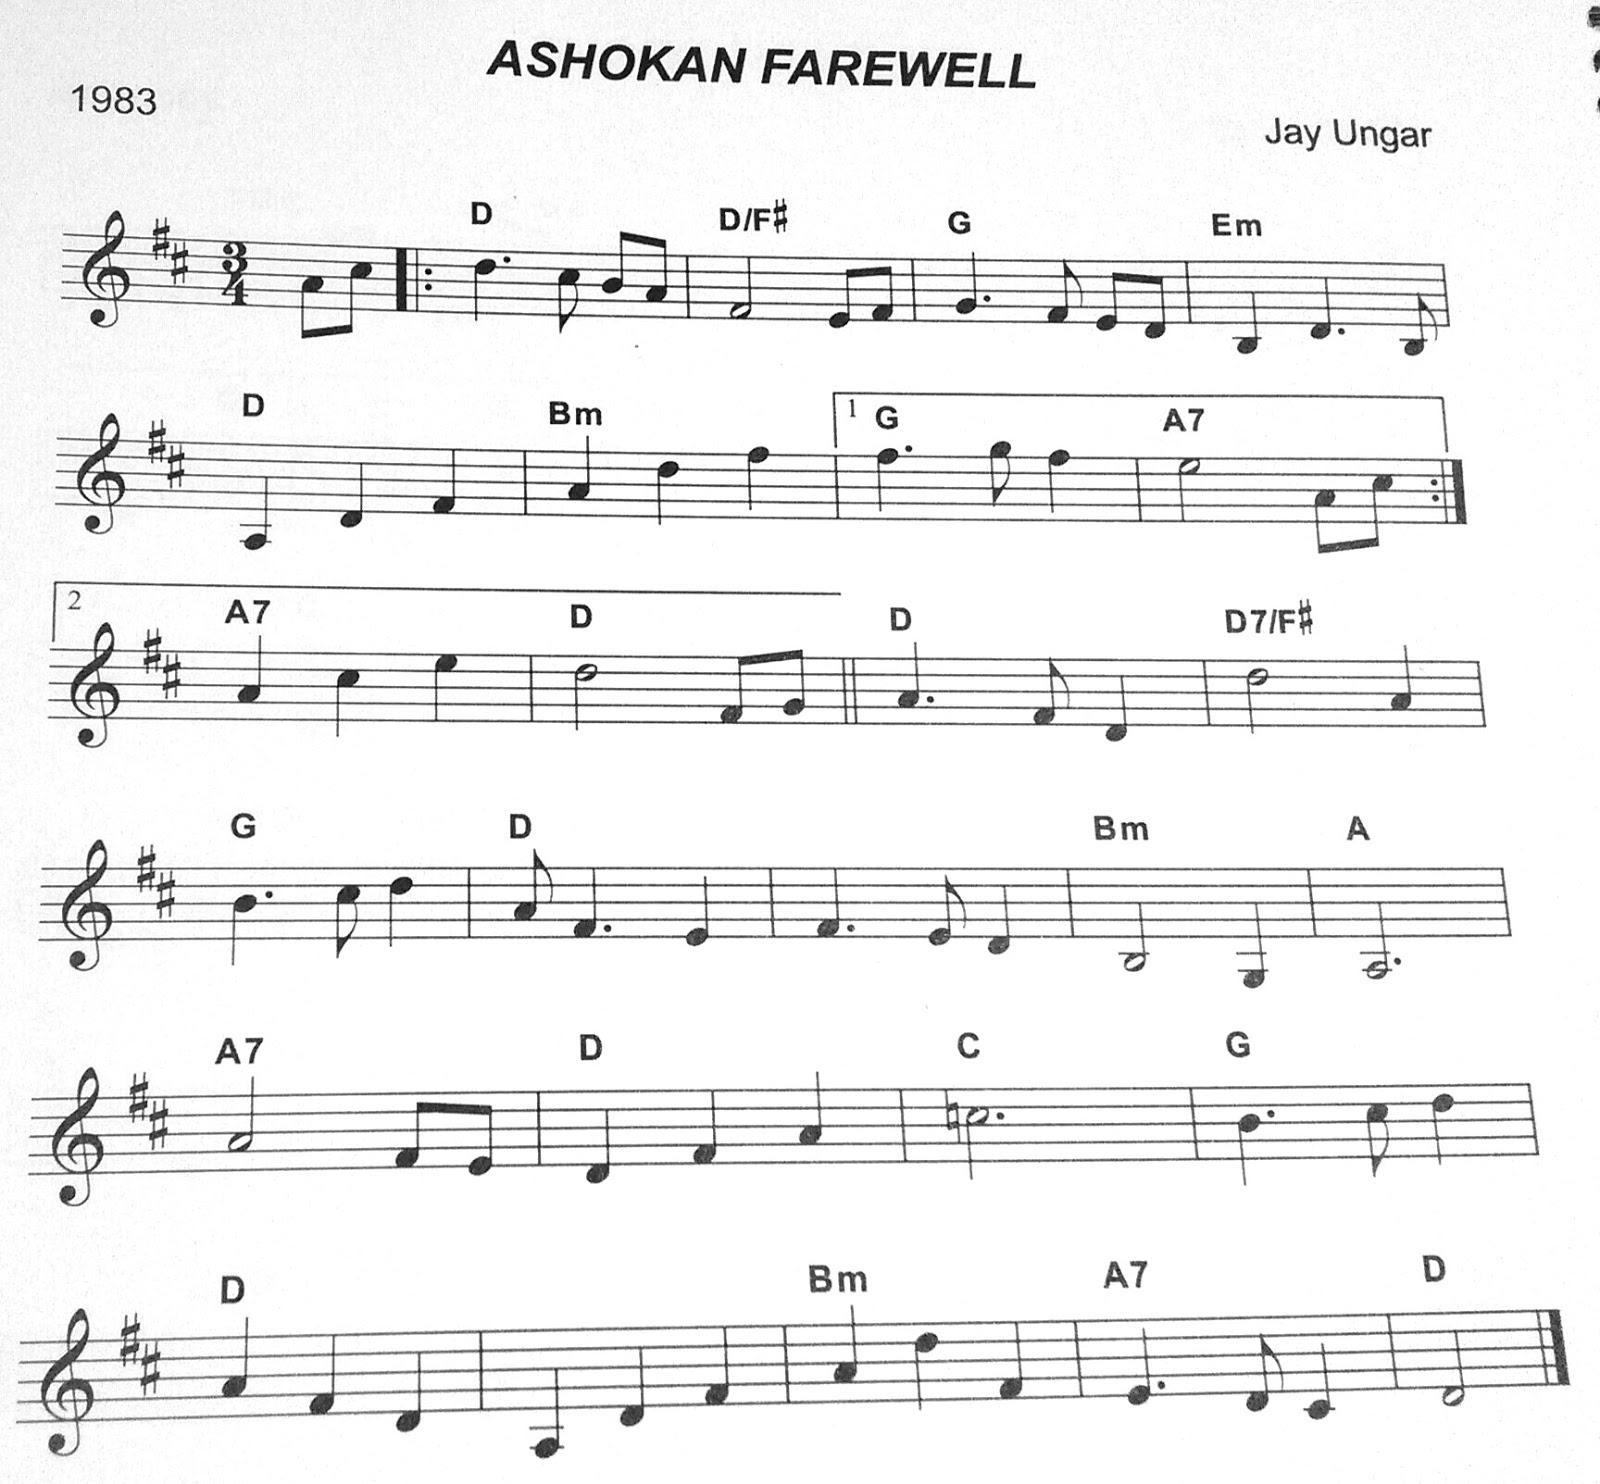 Amazon.com: ashokan farewell sheet music